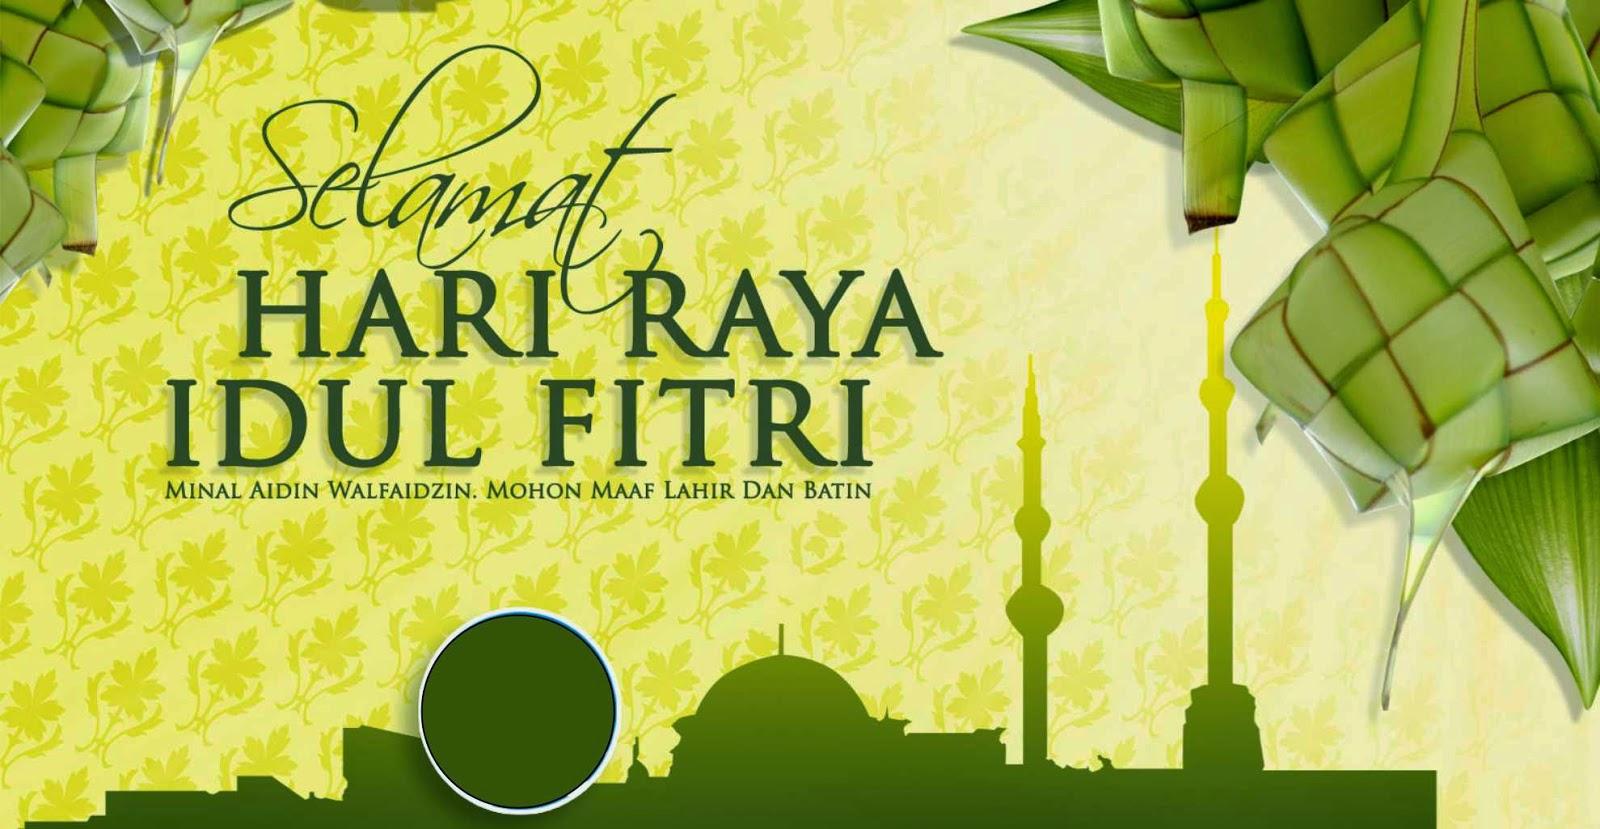 Ucapan Idul Fitri 2021